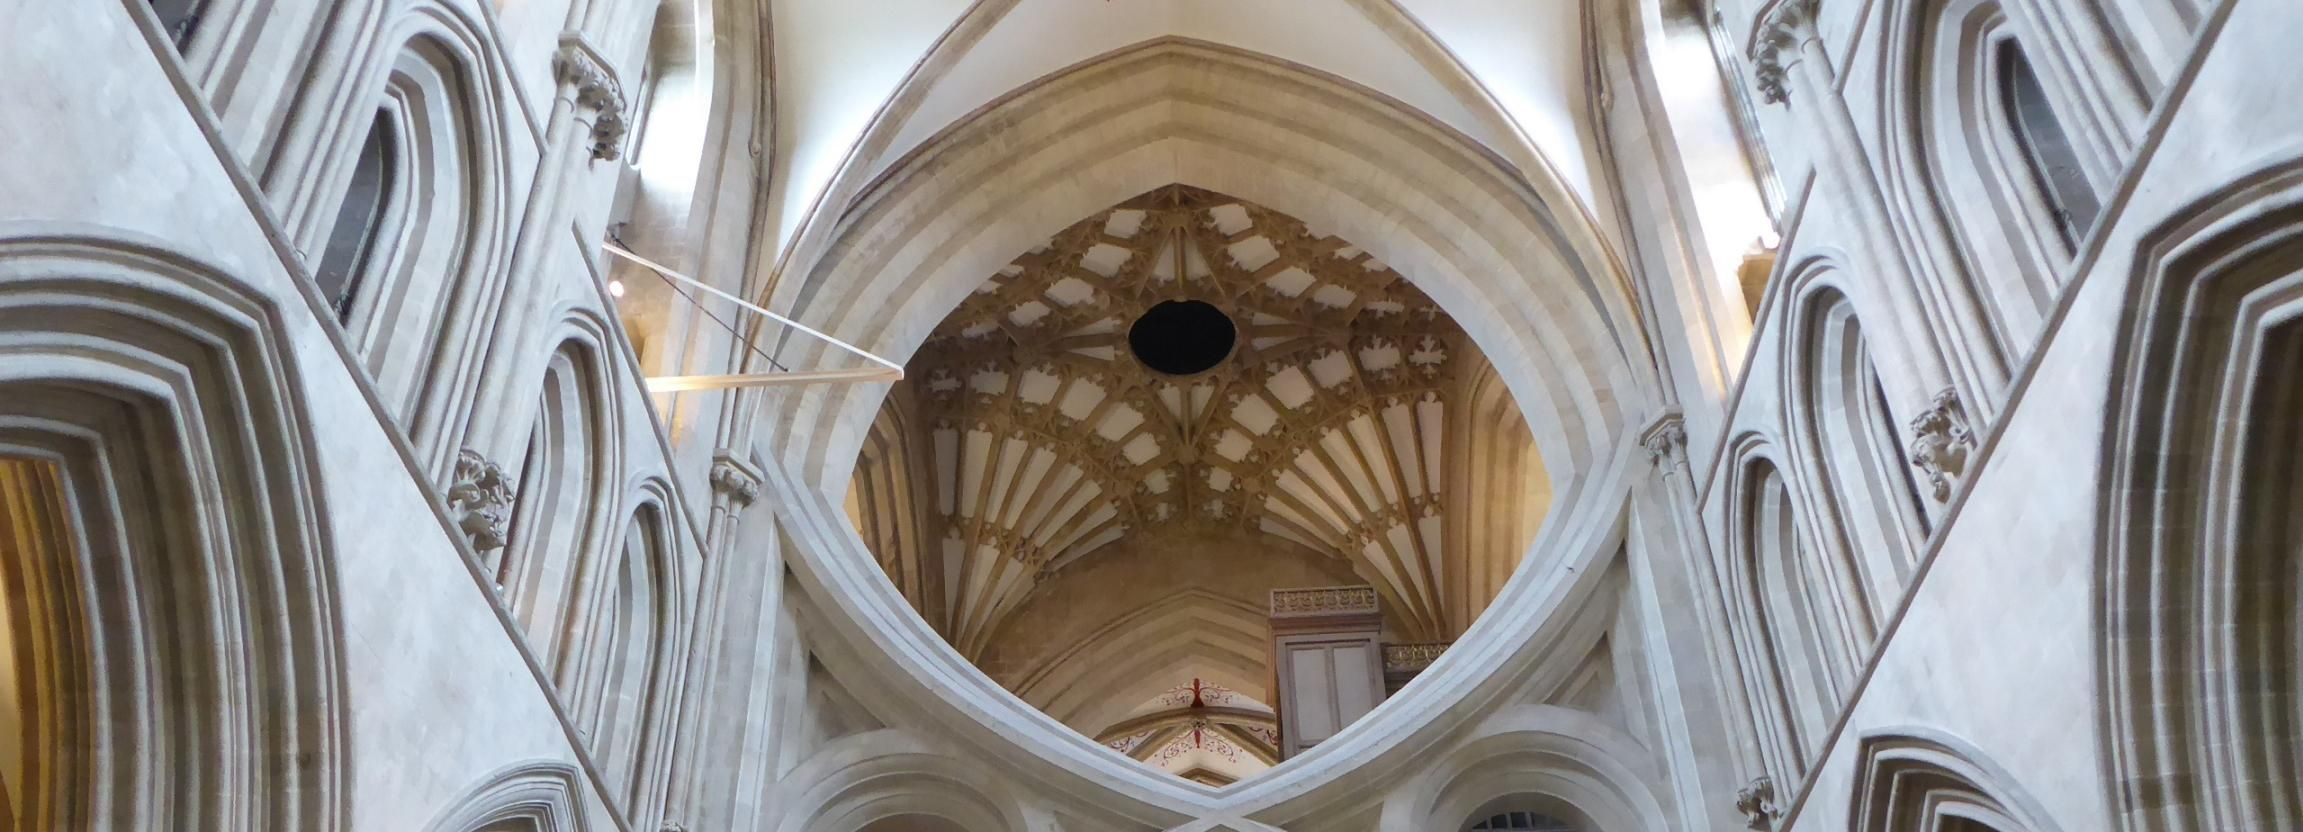 Wells, Cheddar Cheese & Cheddar Gorge - Day Tour From Bath